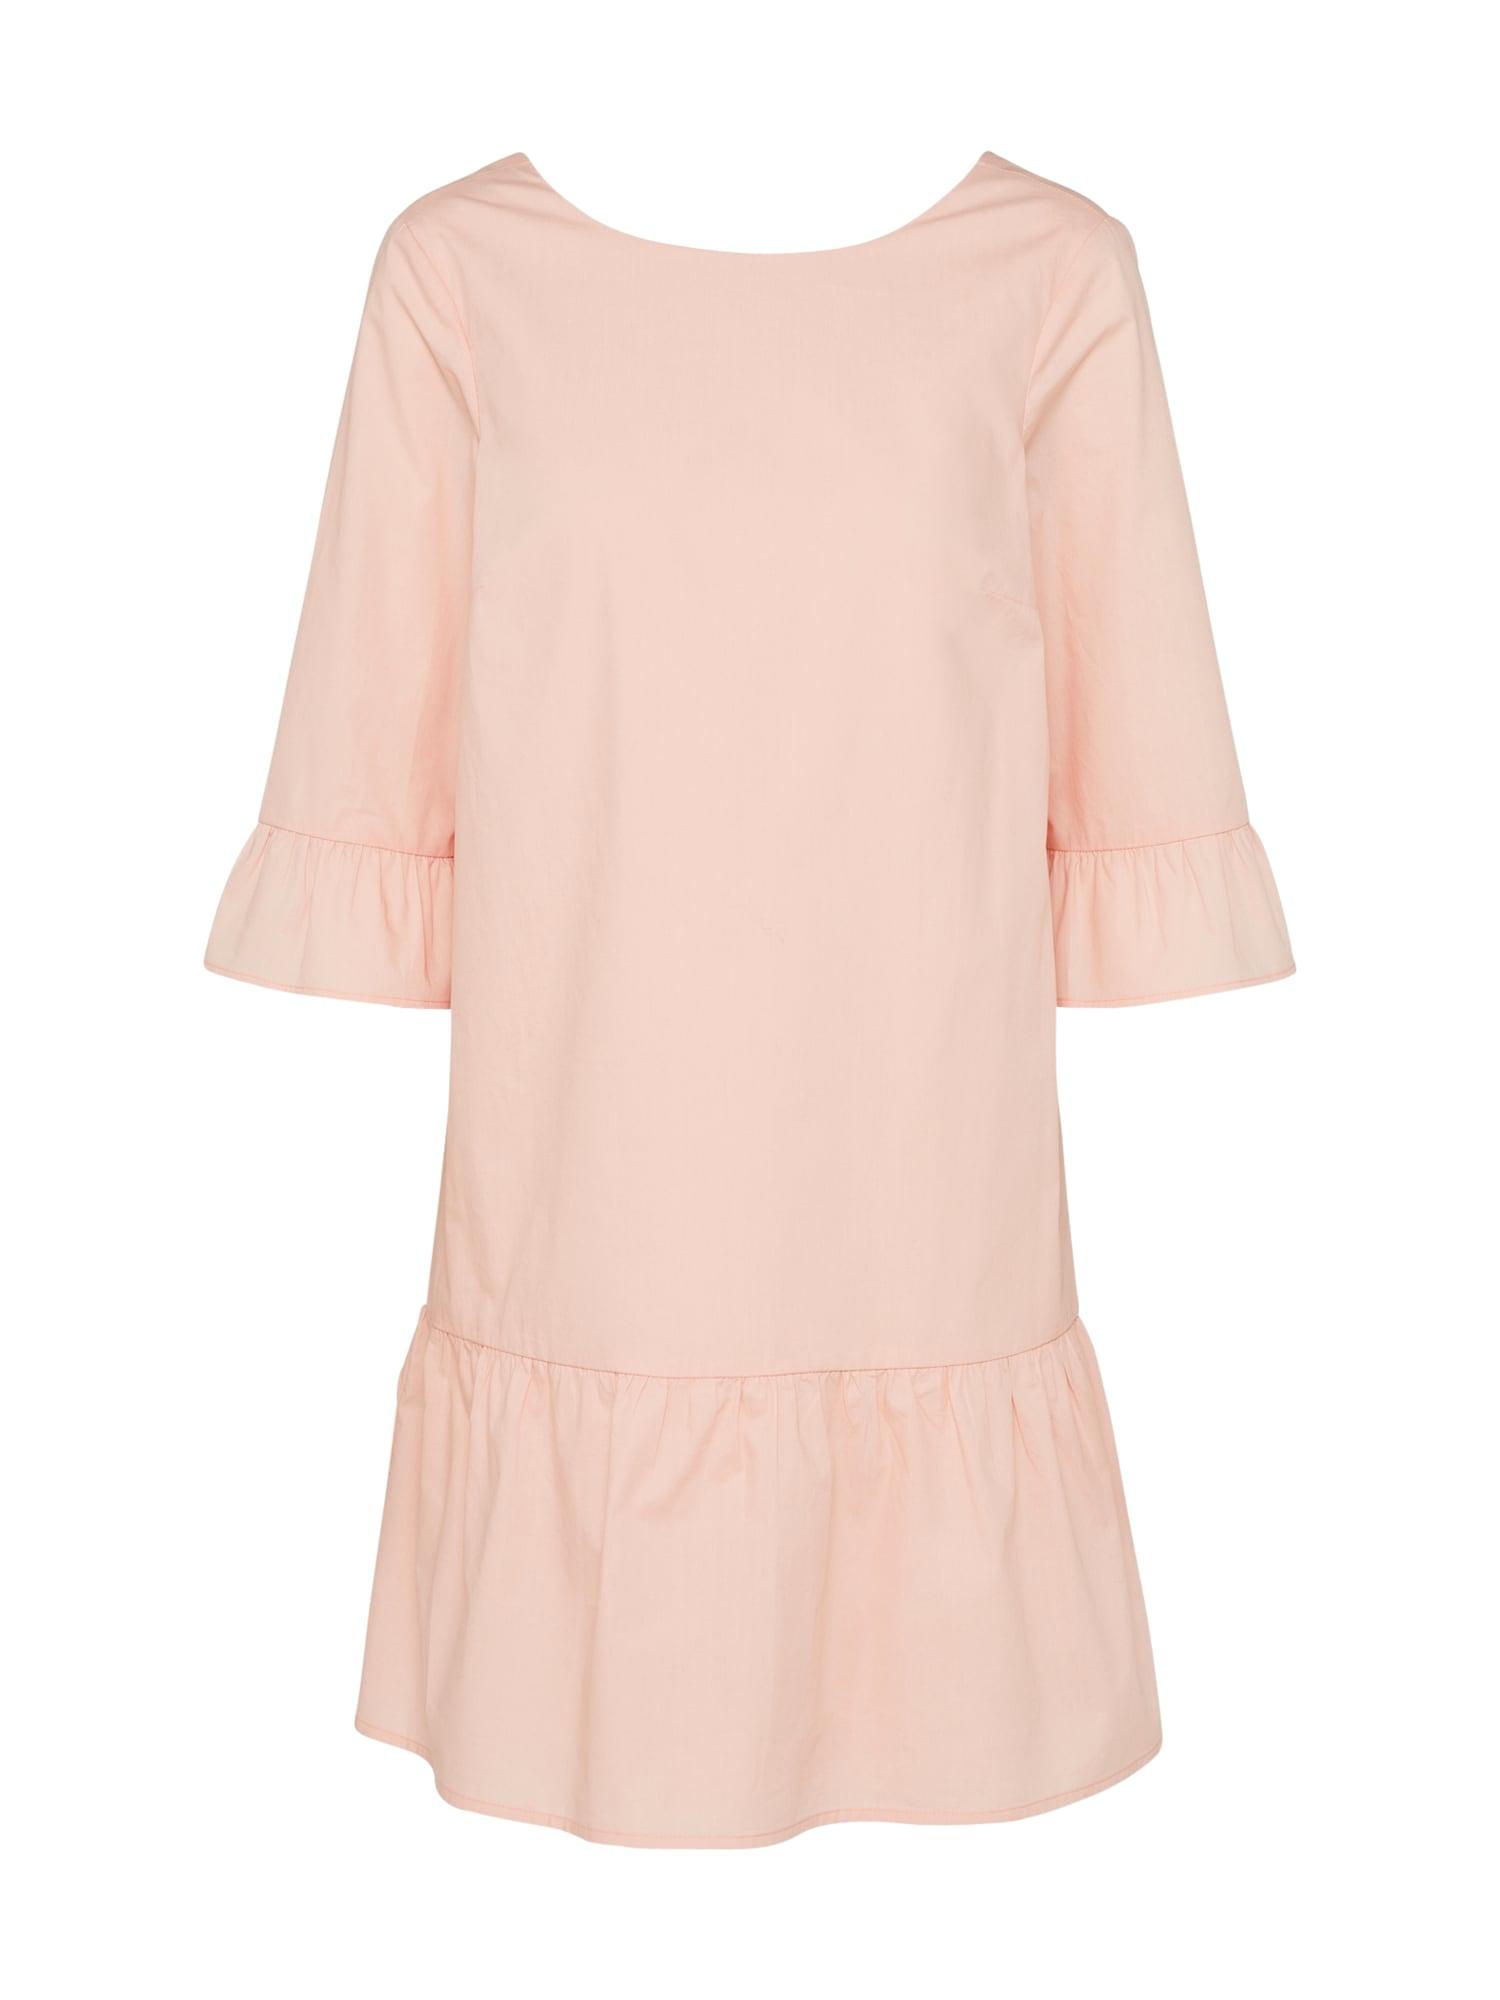 Šaty Aurora meruňková EDITED